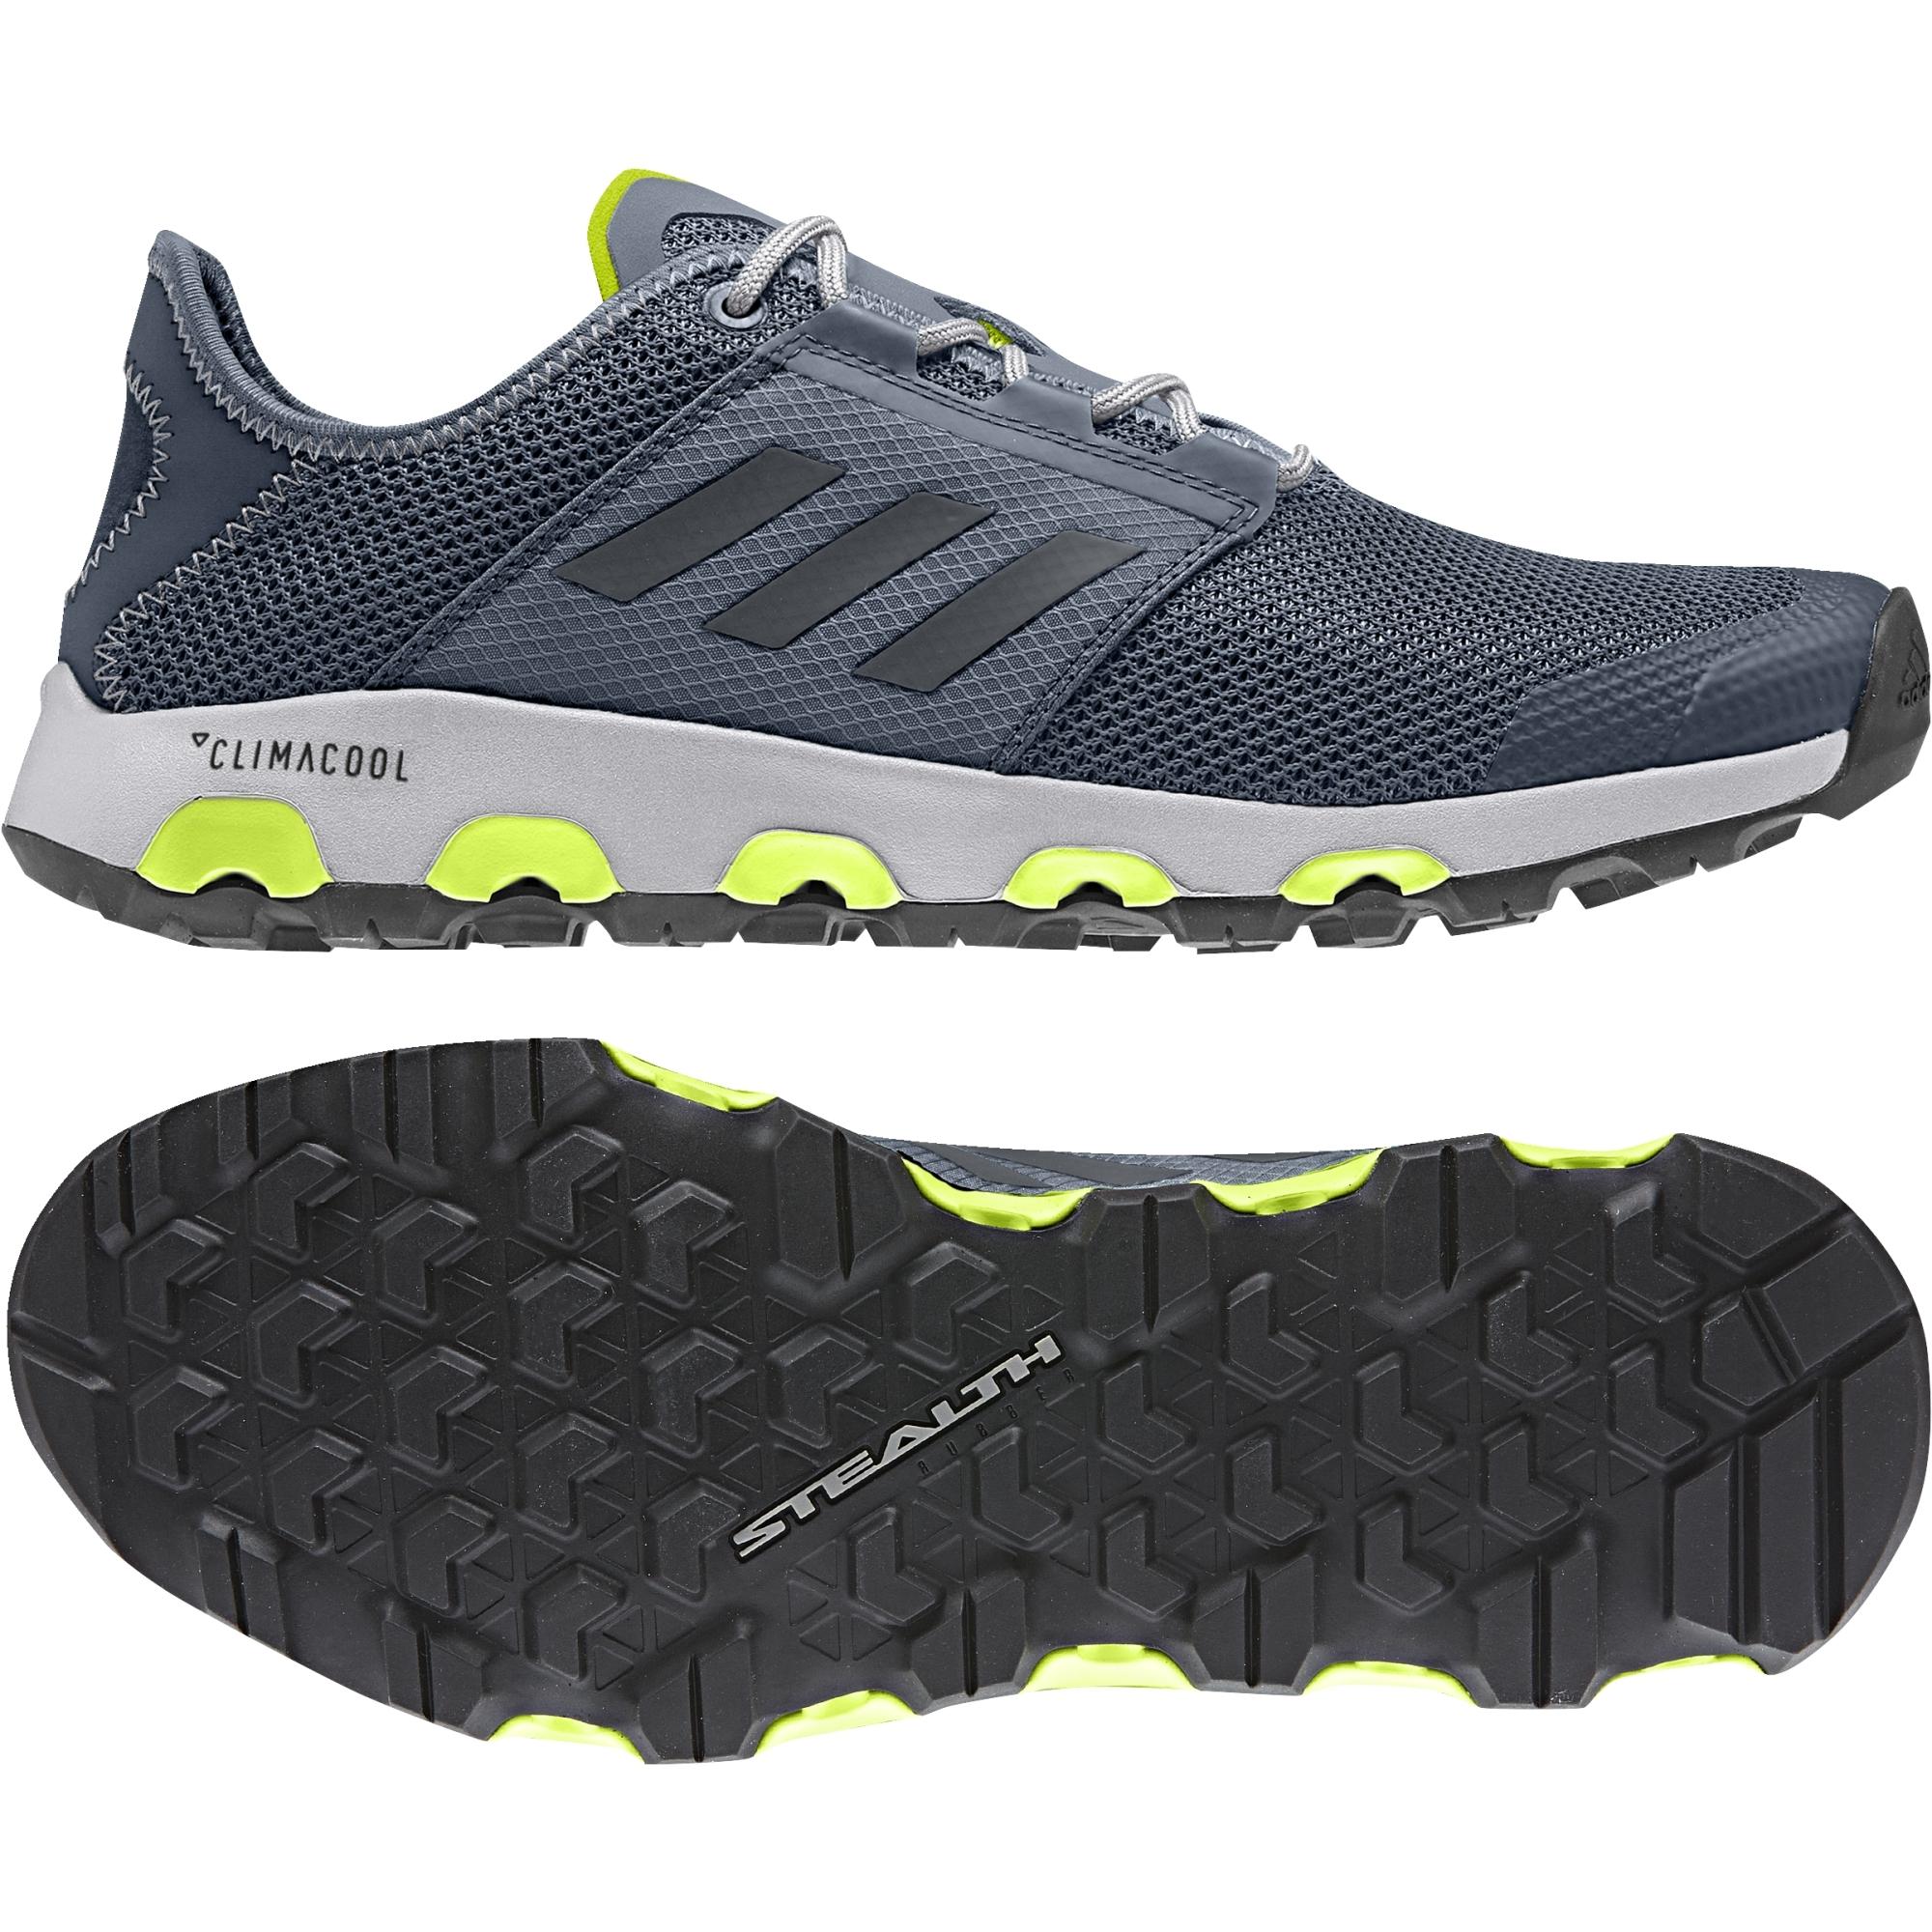 48c20be0db56d adidas TERREX CLIMACOOL VOYAGER, sivé | Športové oblečenie a ...